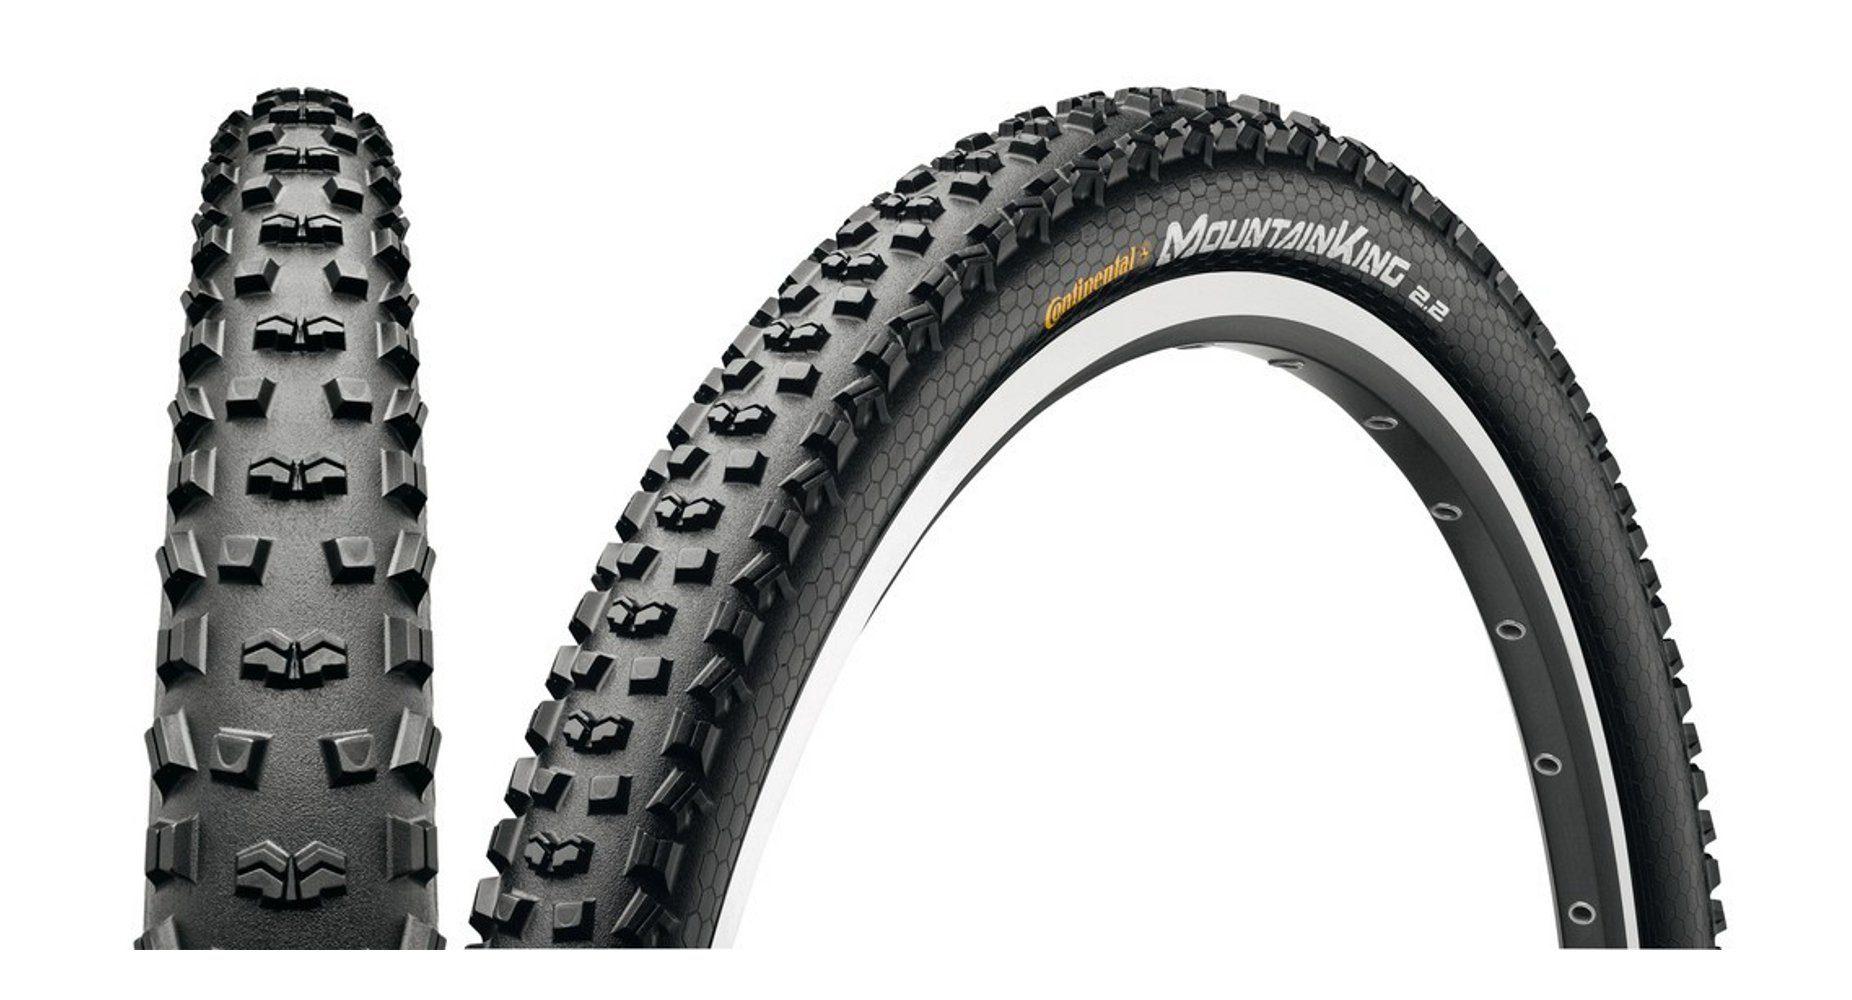 Continental Fahrradreifen »Mountain King 2.4 Sport 27,5 Zoll Draht Skin«